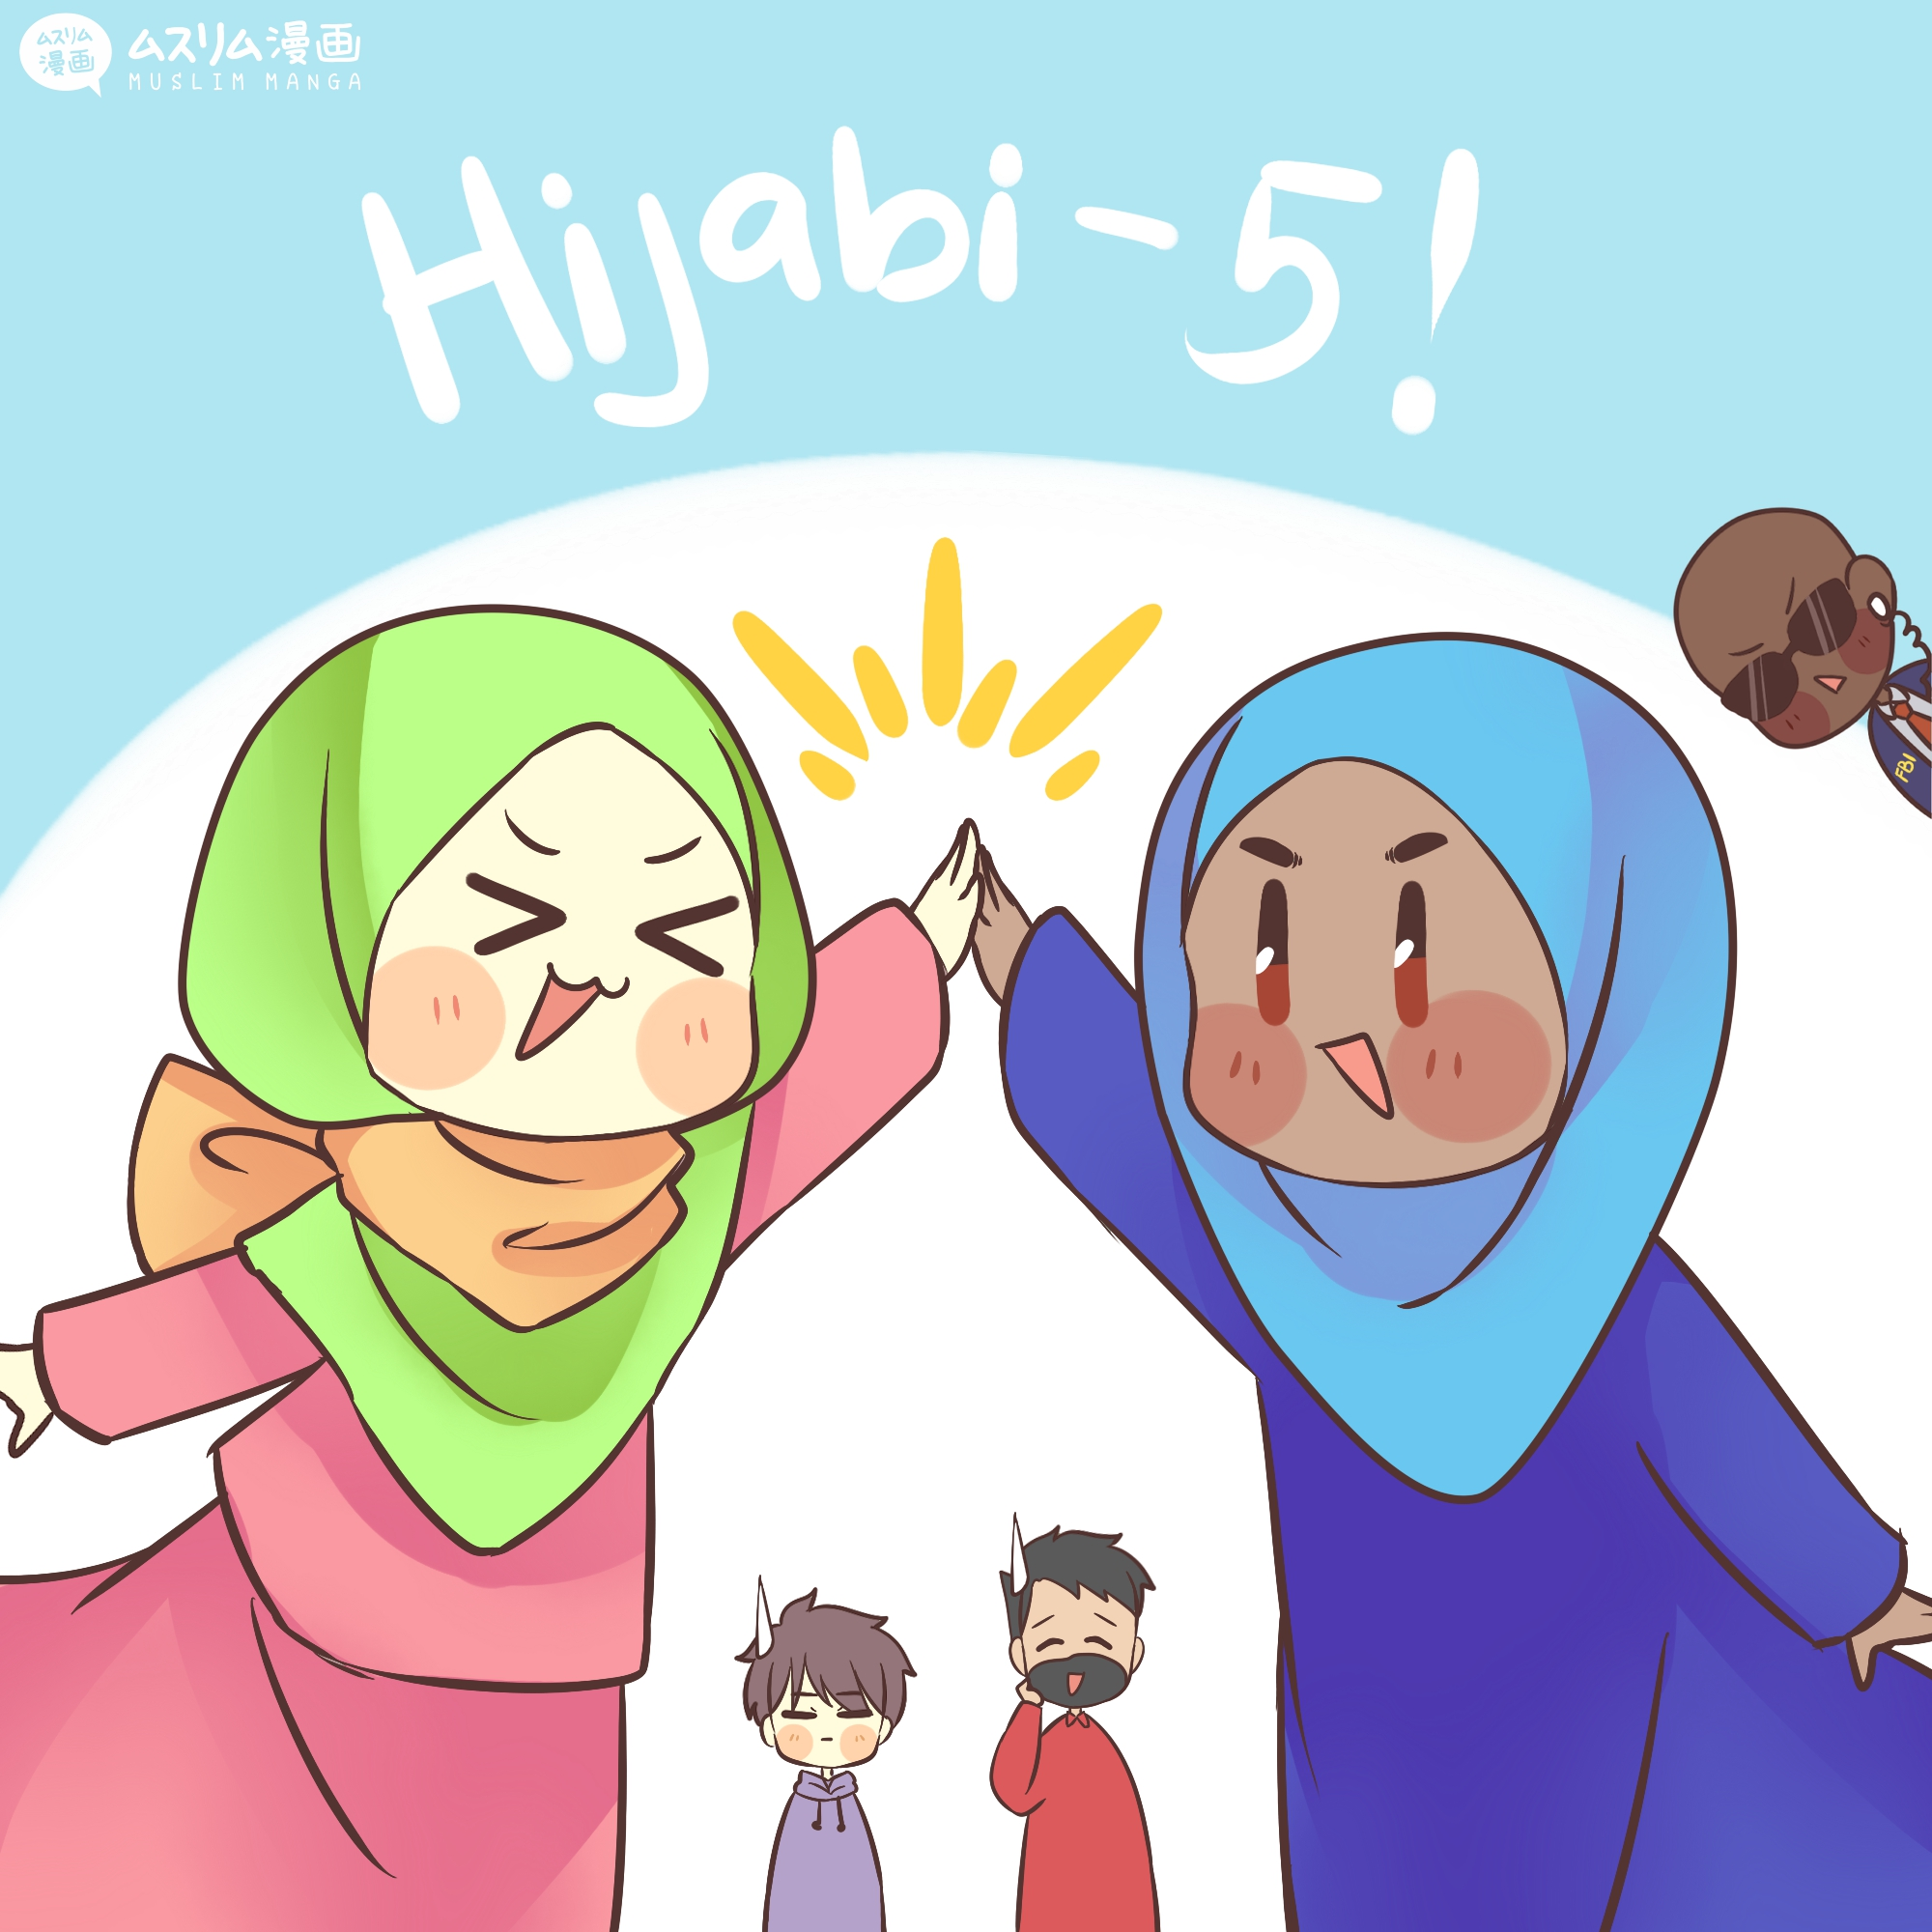 muslim manga and huda f